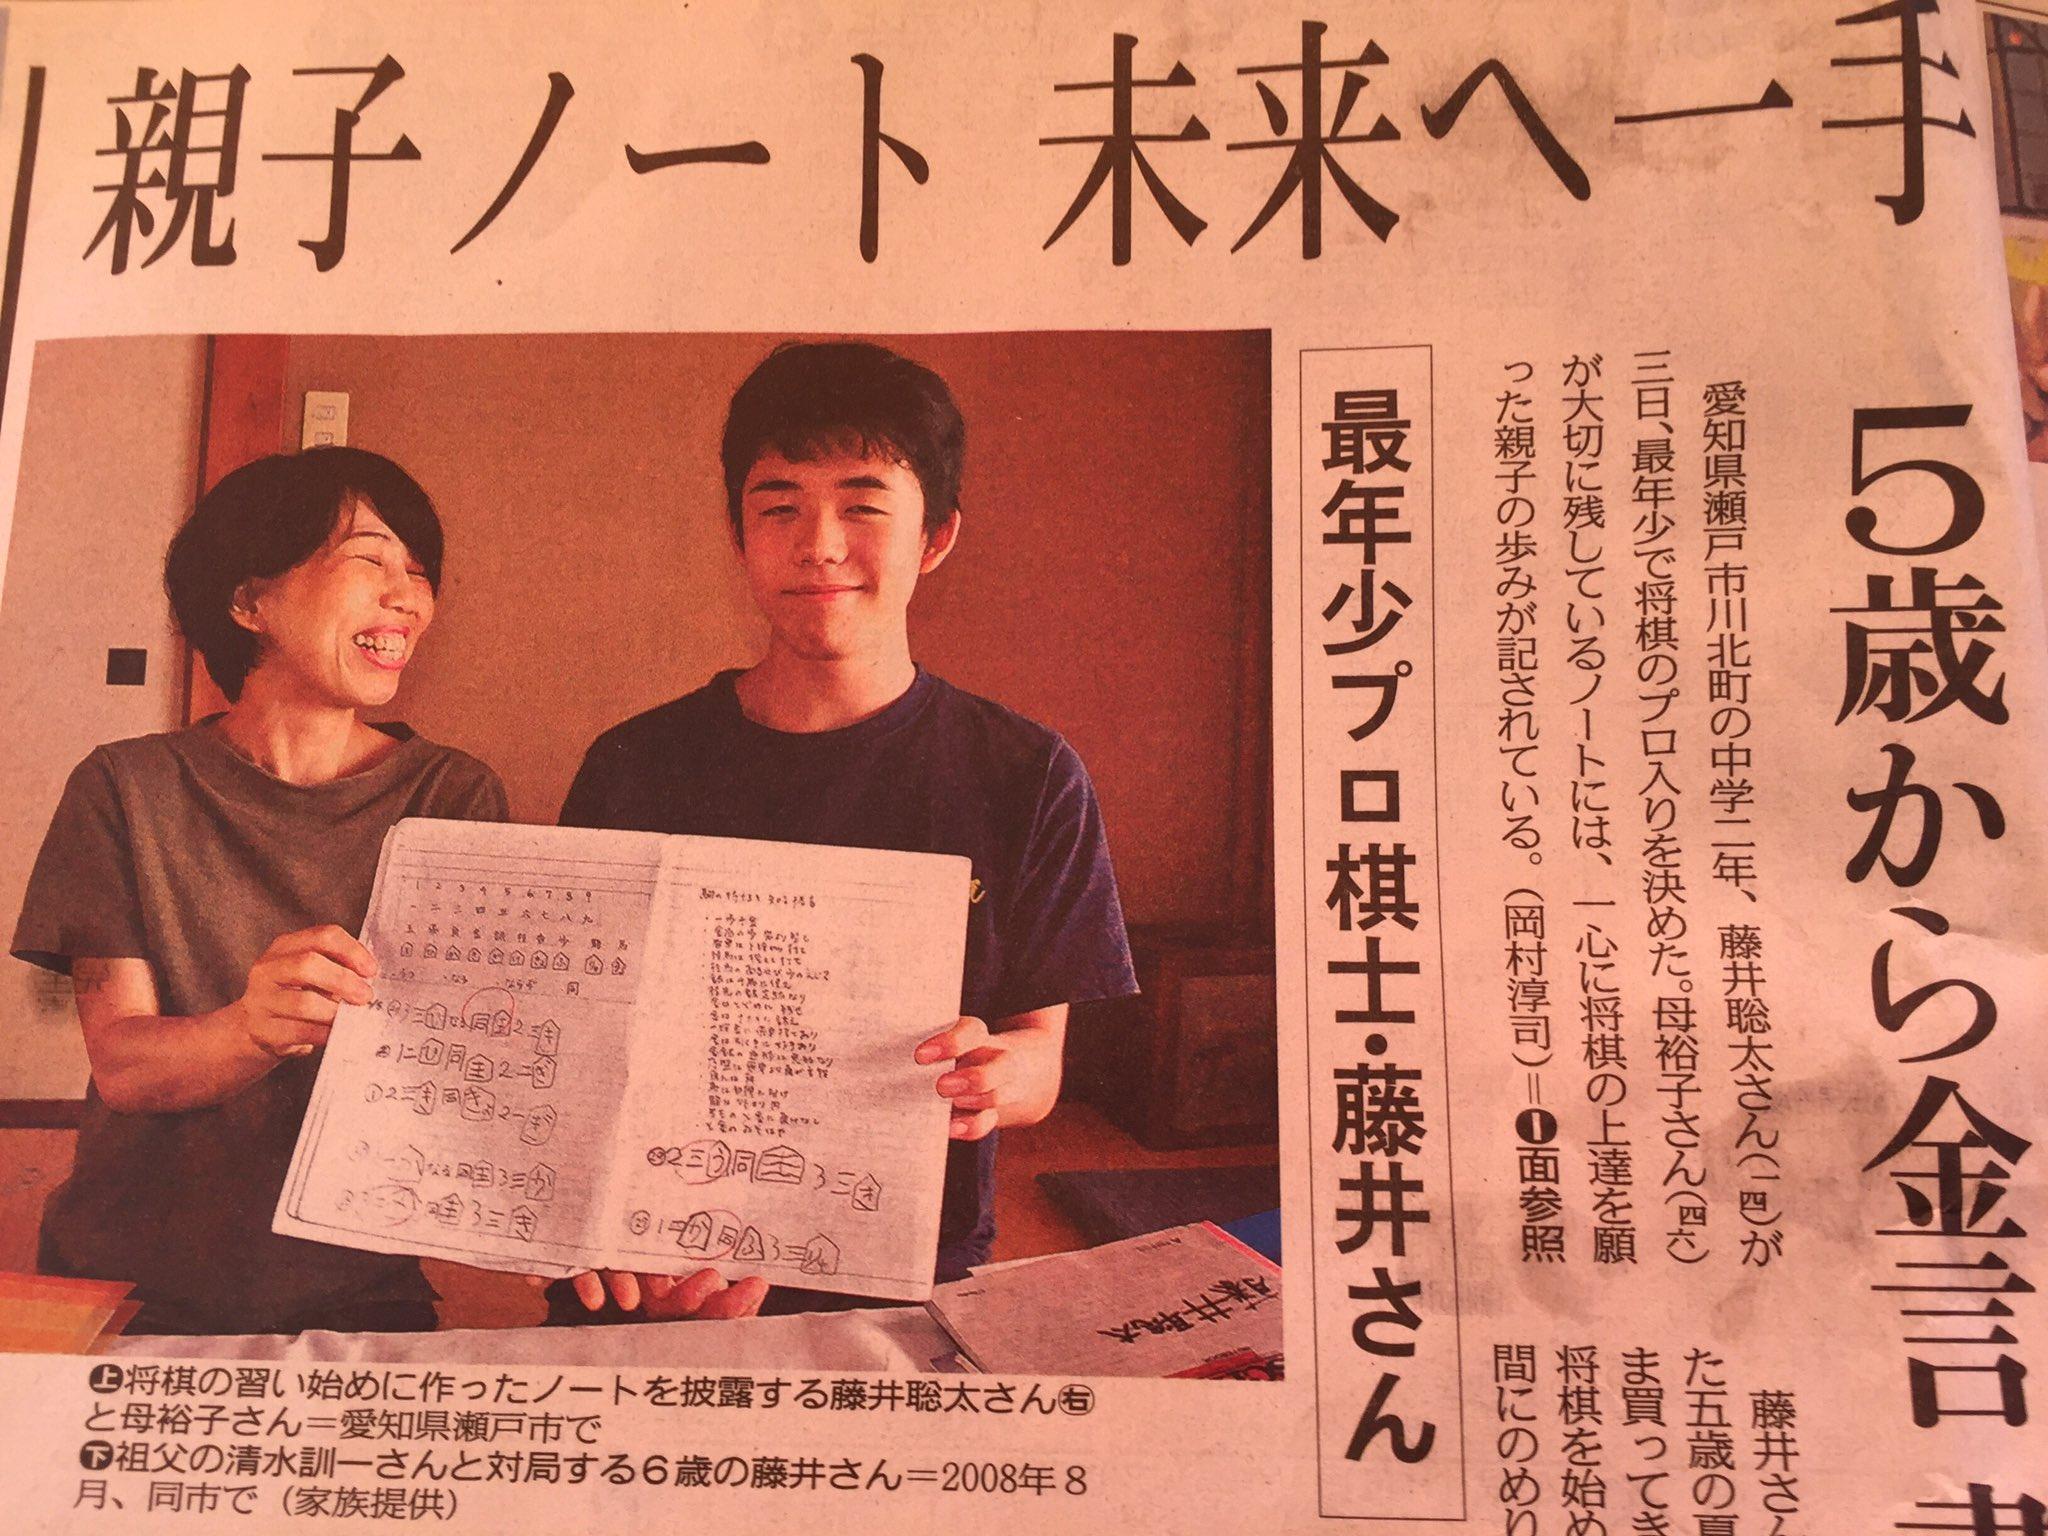 藤井 聡太 の 家族